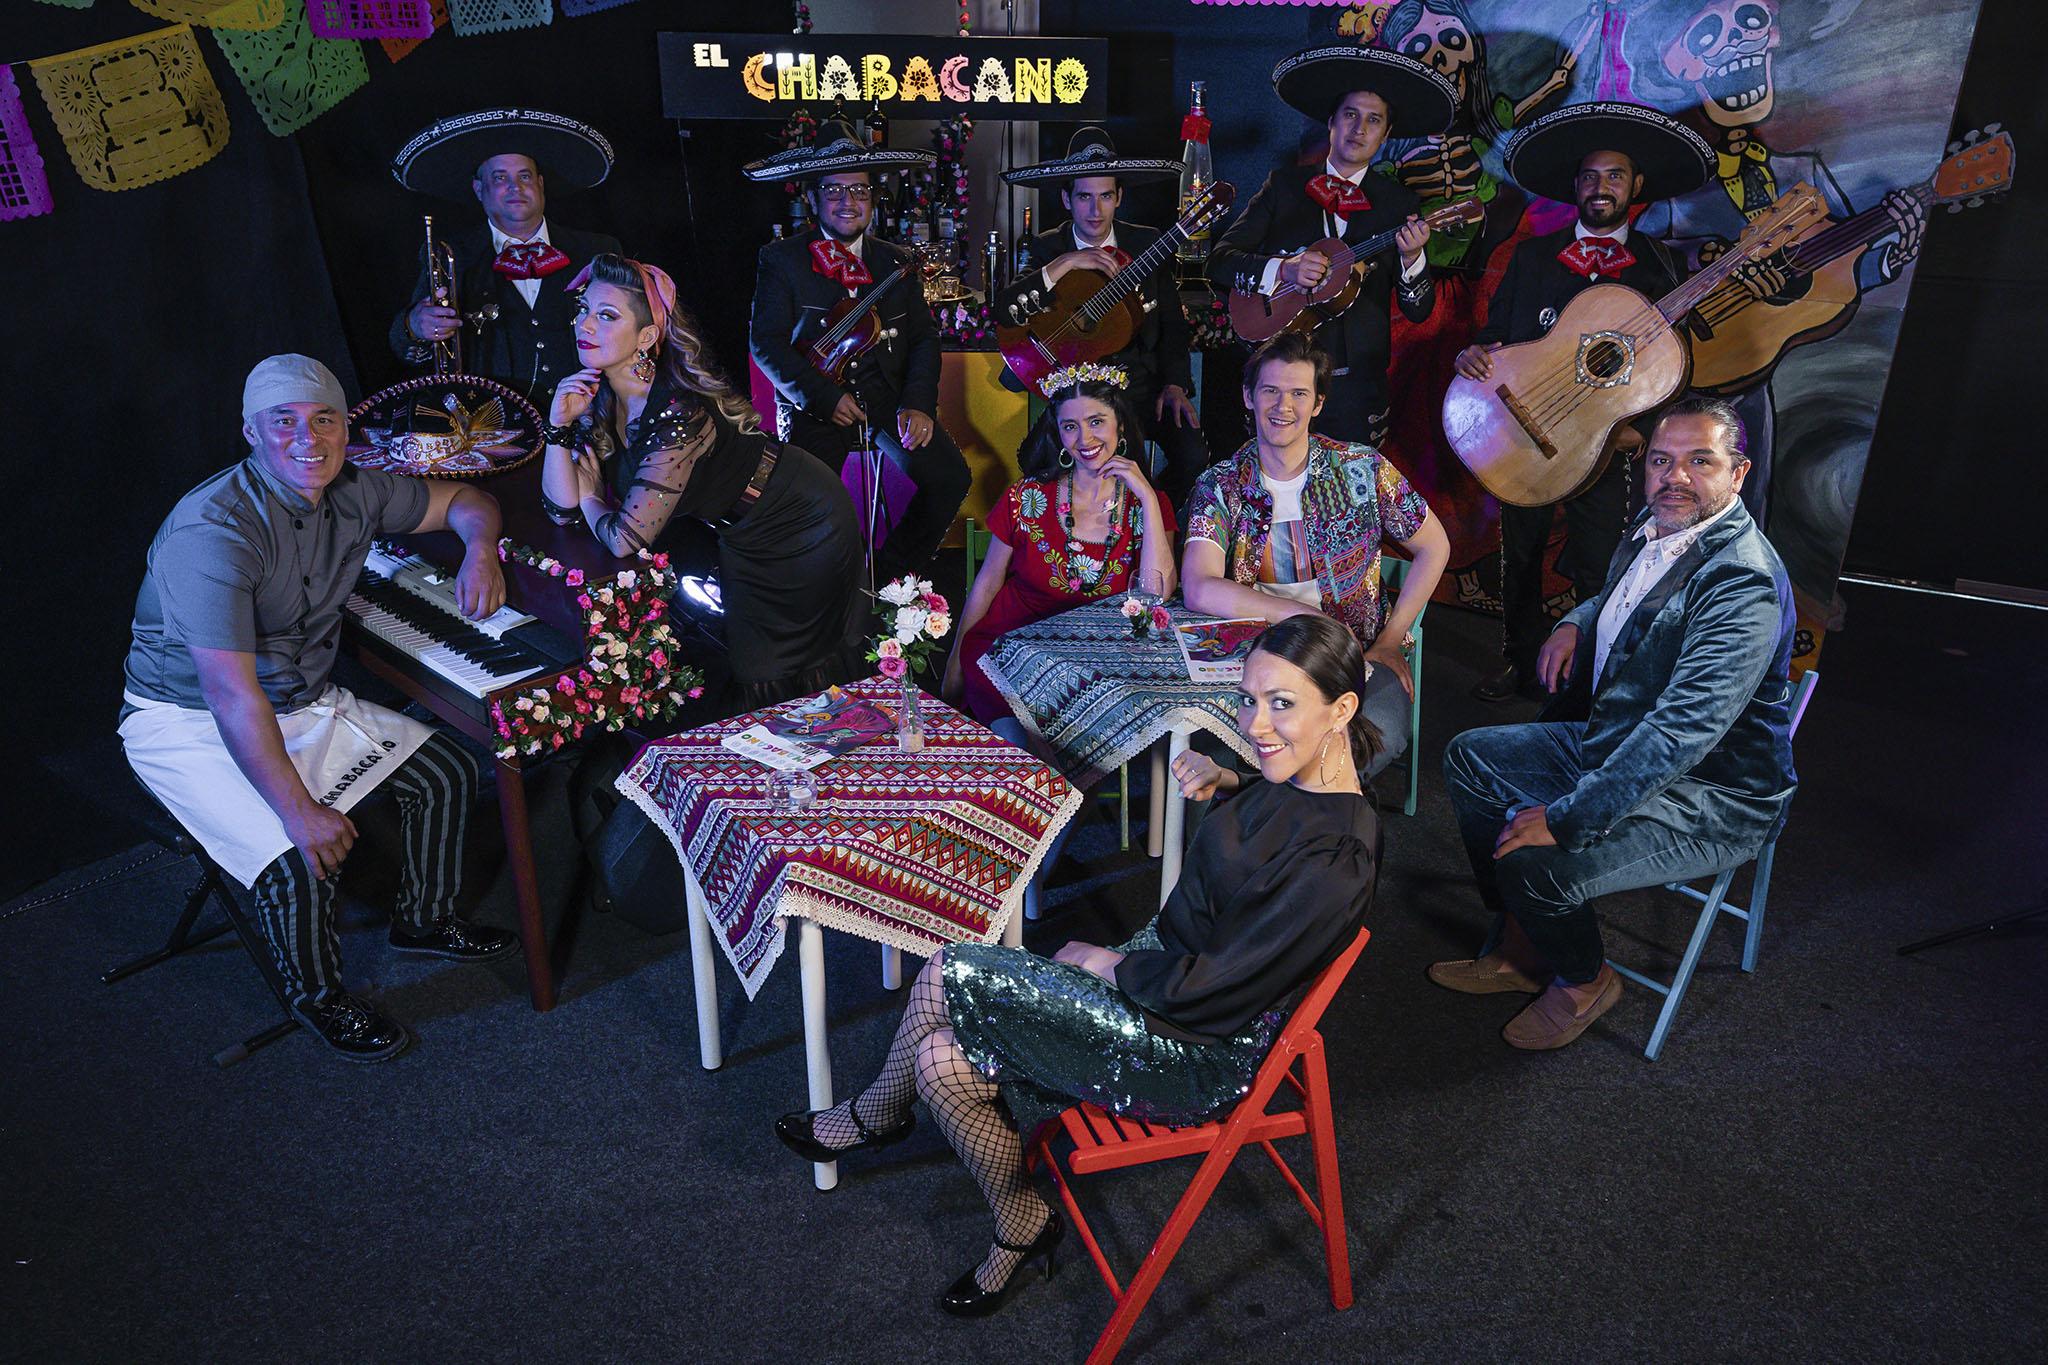 El Chabacano - ein lateinamerikanisches Musical - Foto: Omar Navarrete